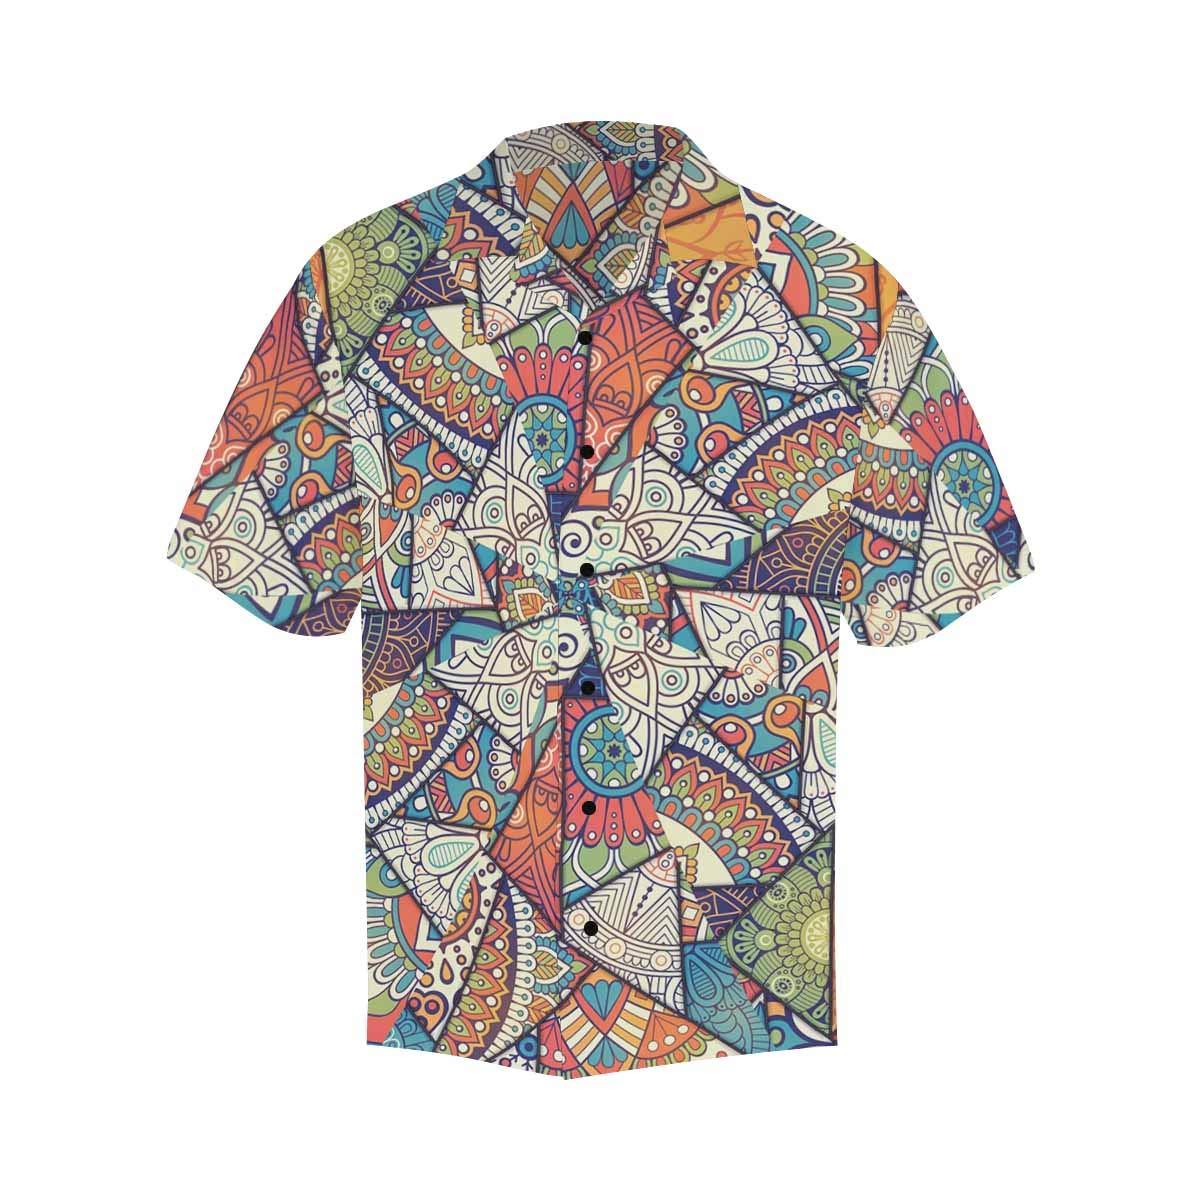 InterestPrint Mens Shirt Paris Landmark Printed Mens T-Shirts